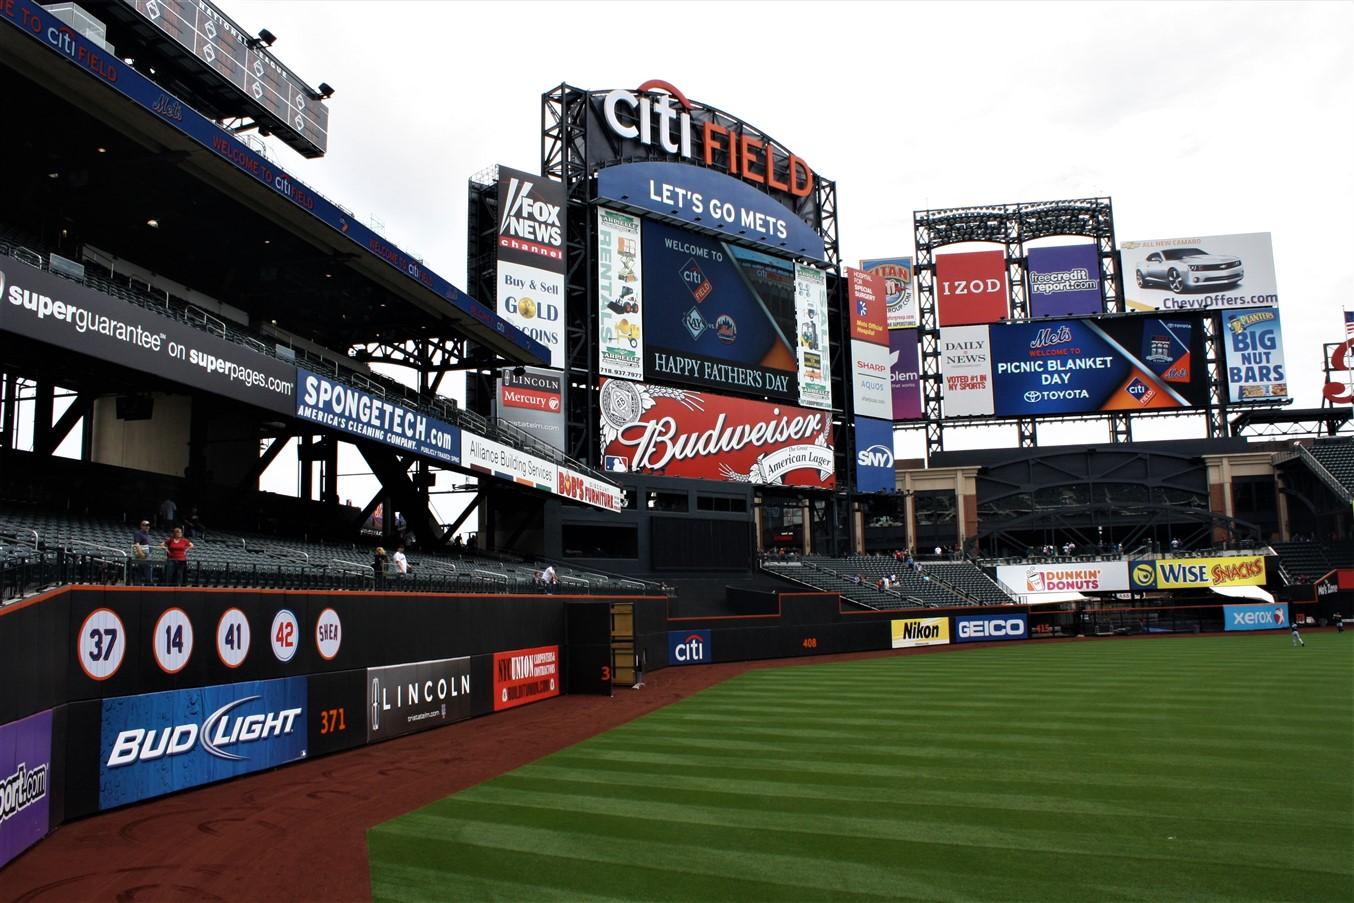 2009 06 21 Law School Road Trip Day 6 New York Mets 61.jpg